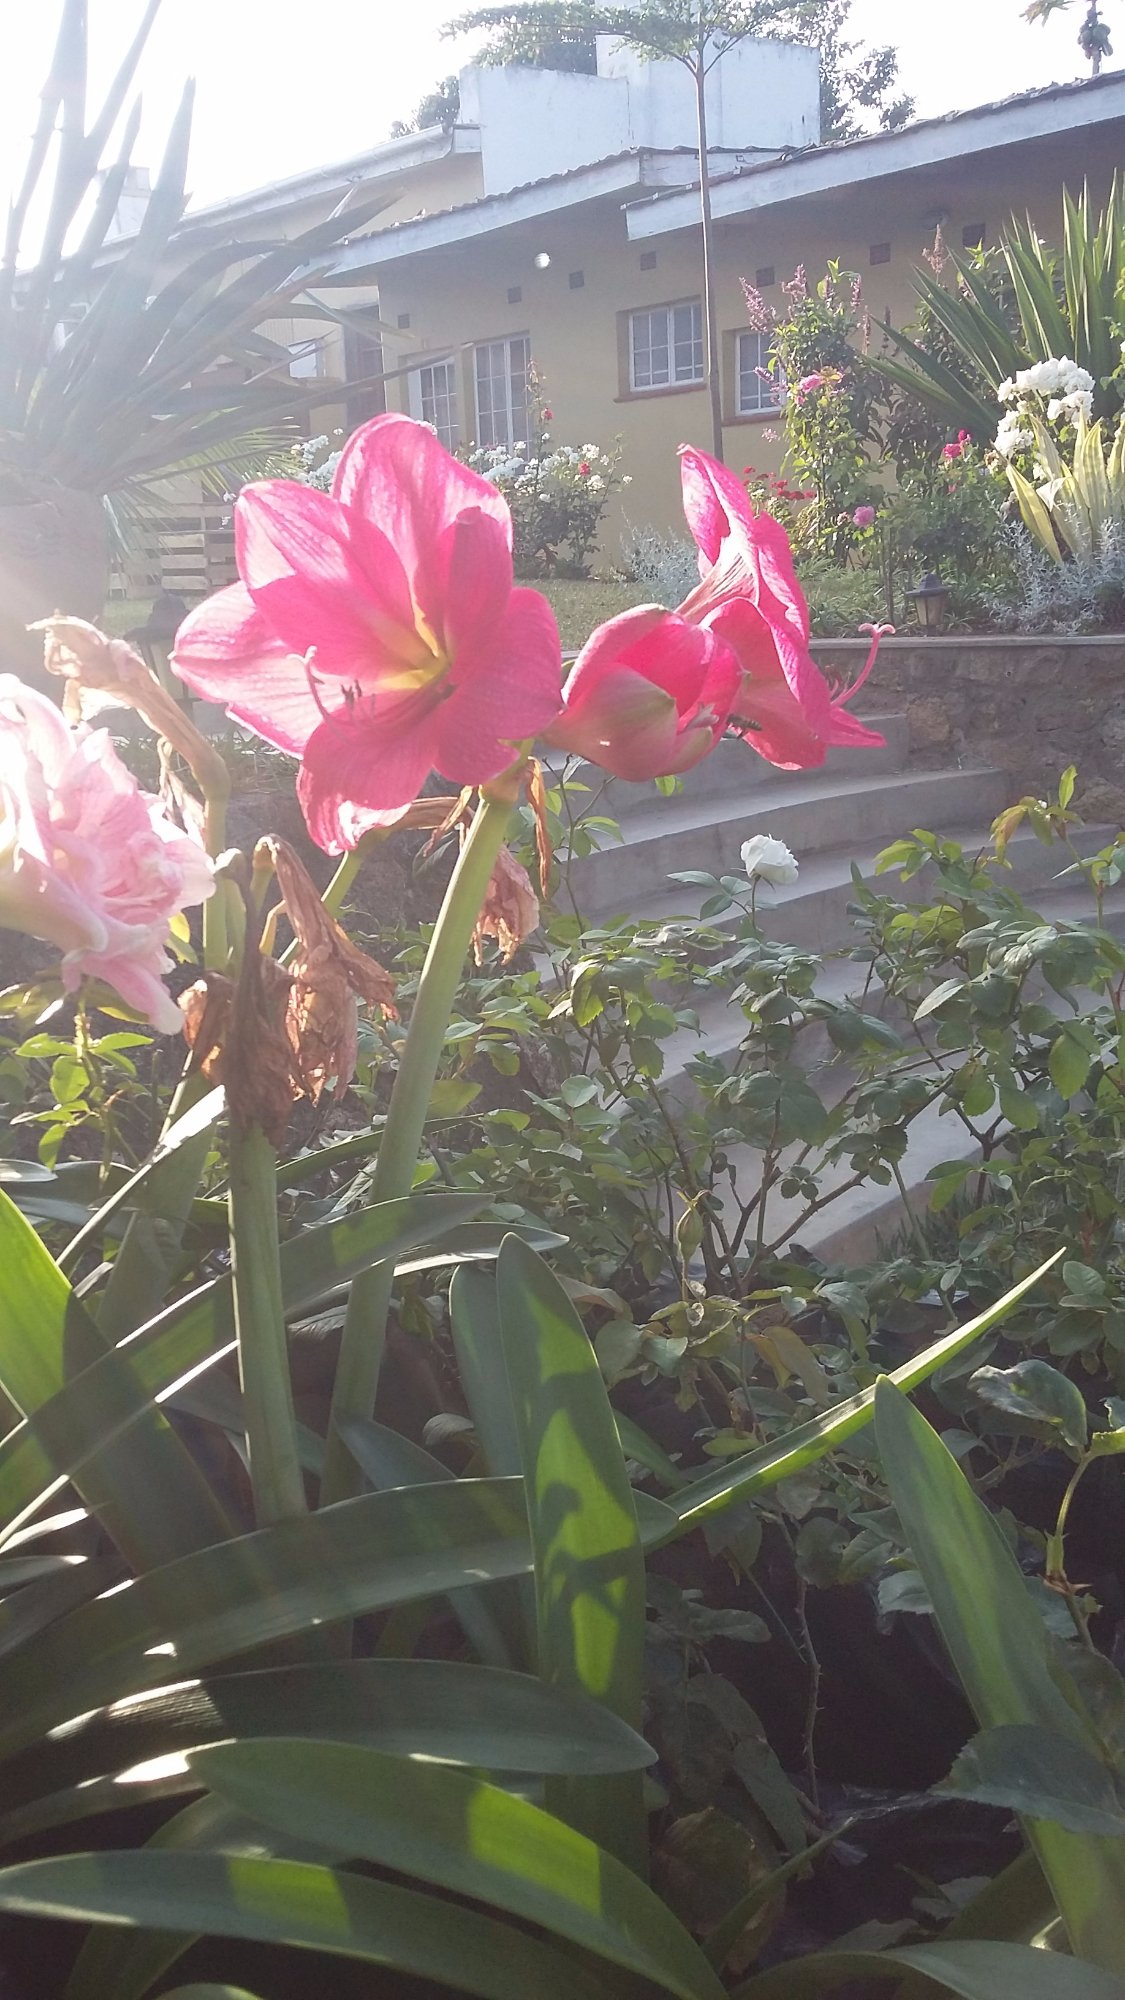 Village green blantyre malawi lodge reviews photos tripadvisor